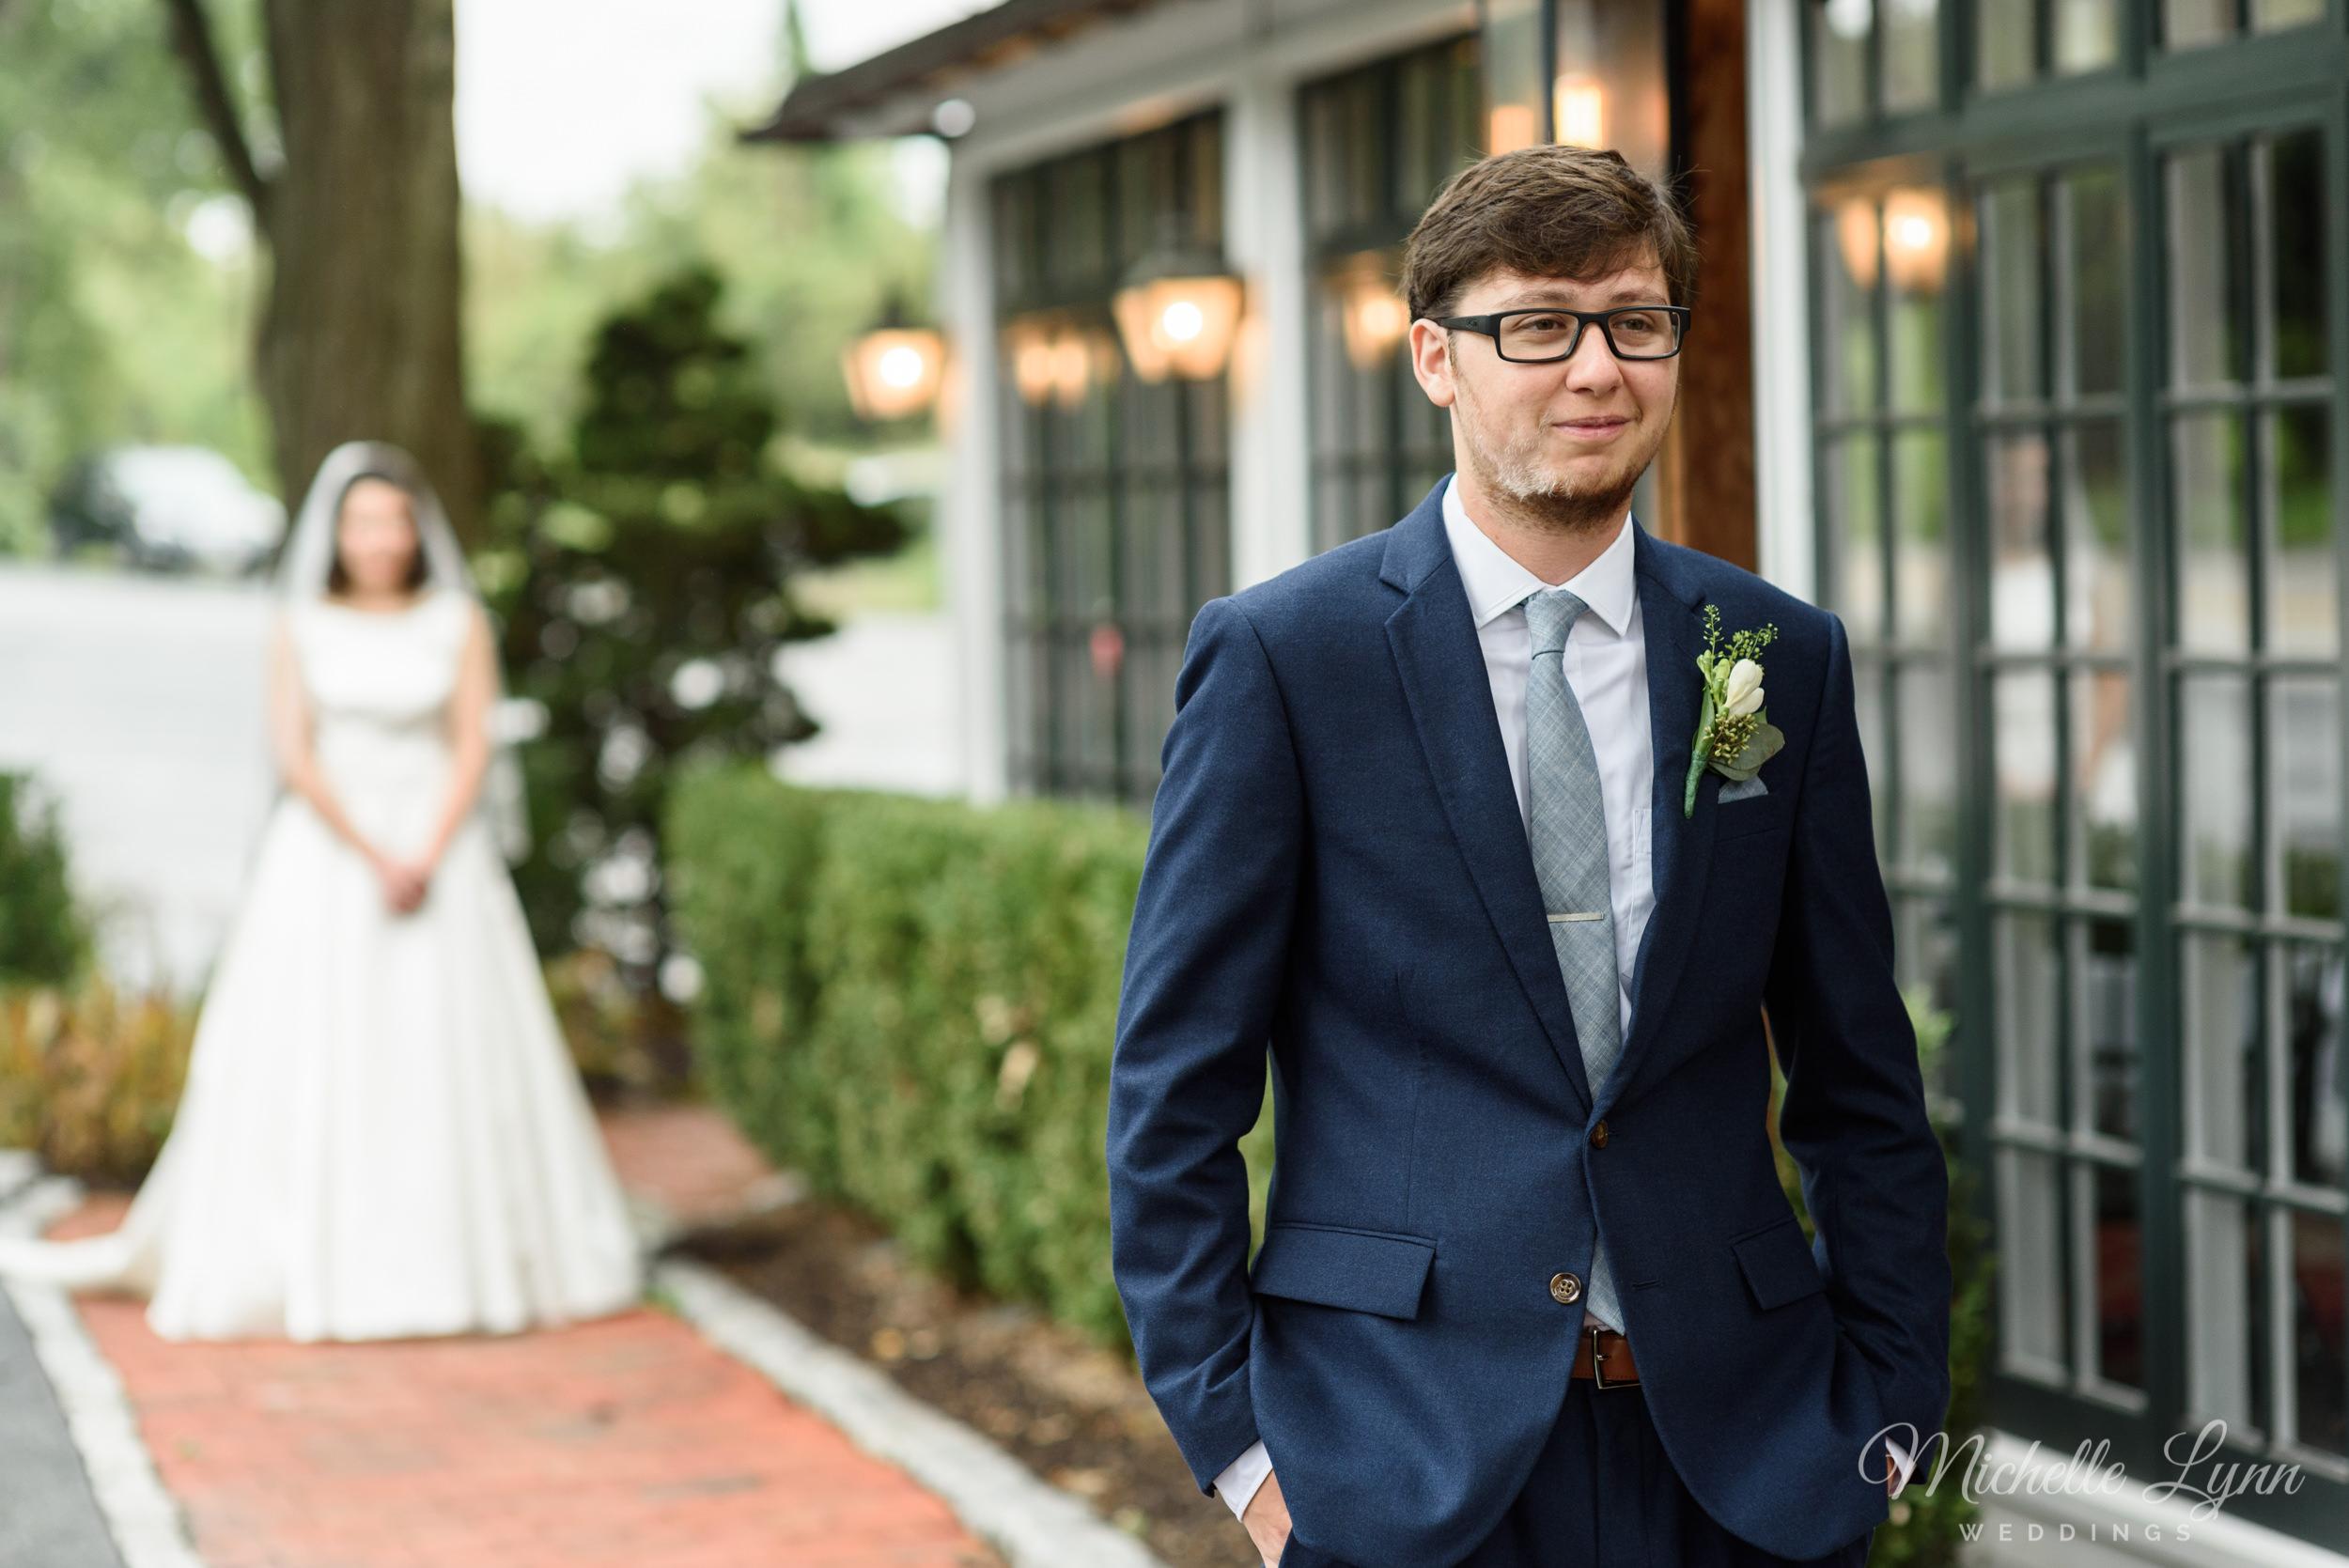 mlw-general-warren-malvern-wedding-photographer-6.jpg